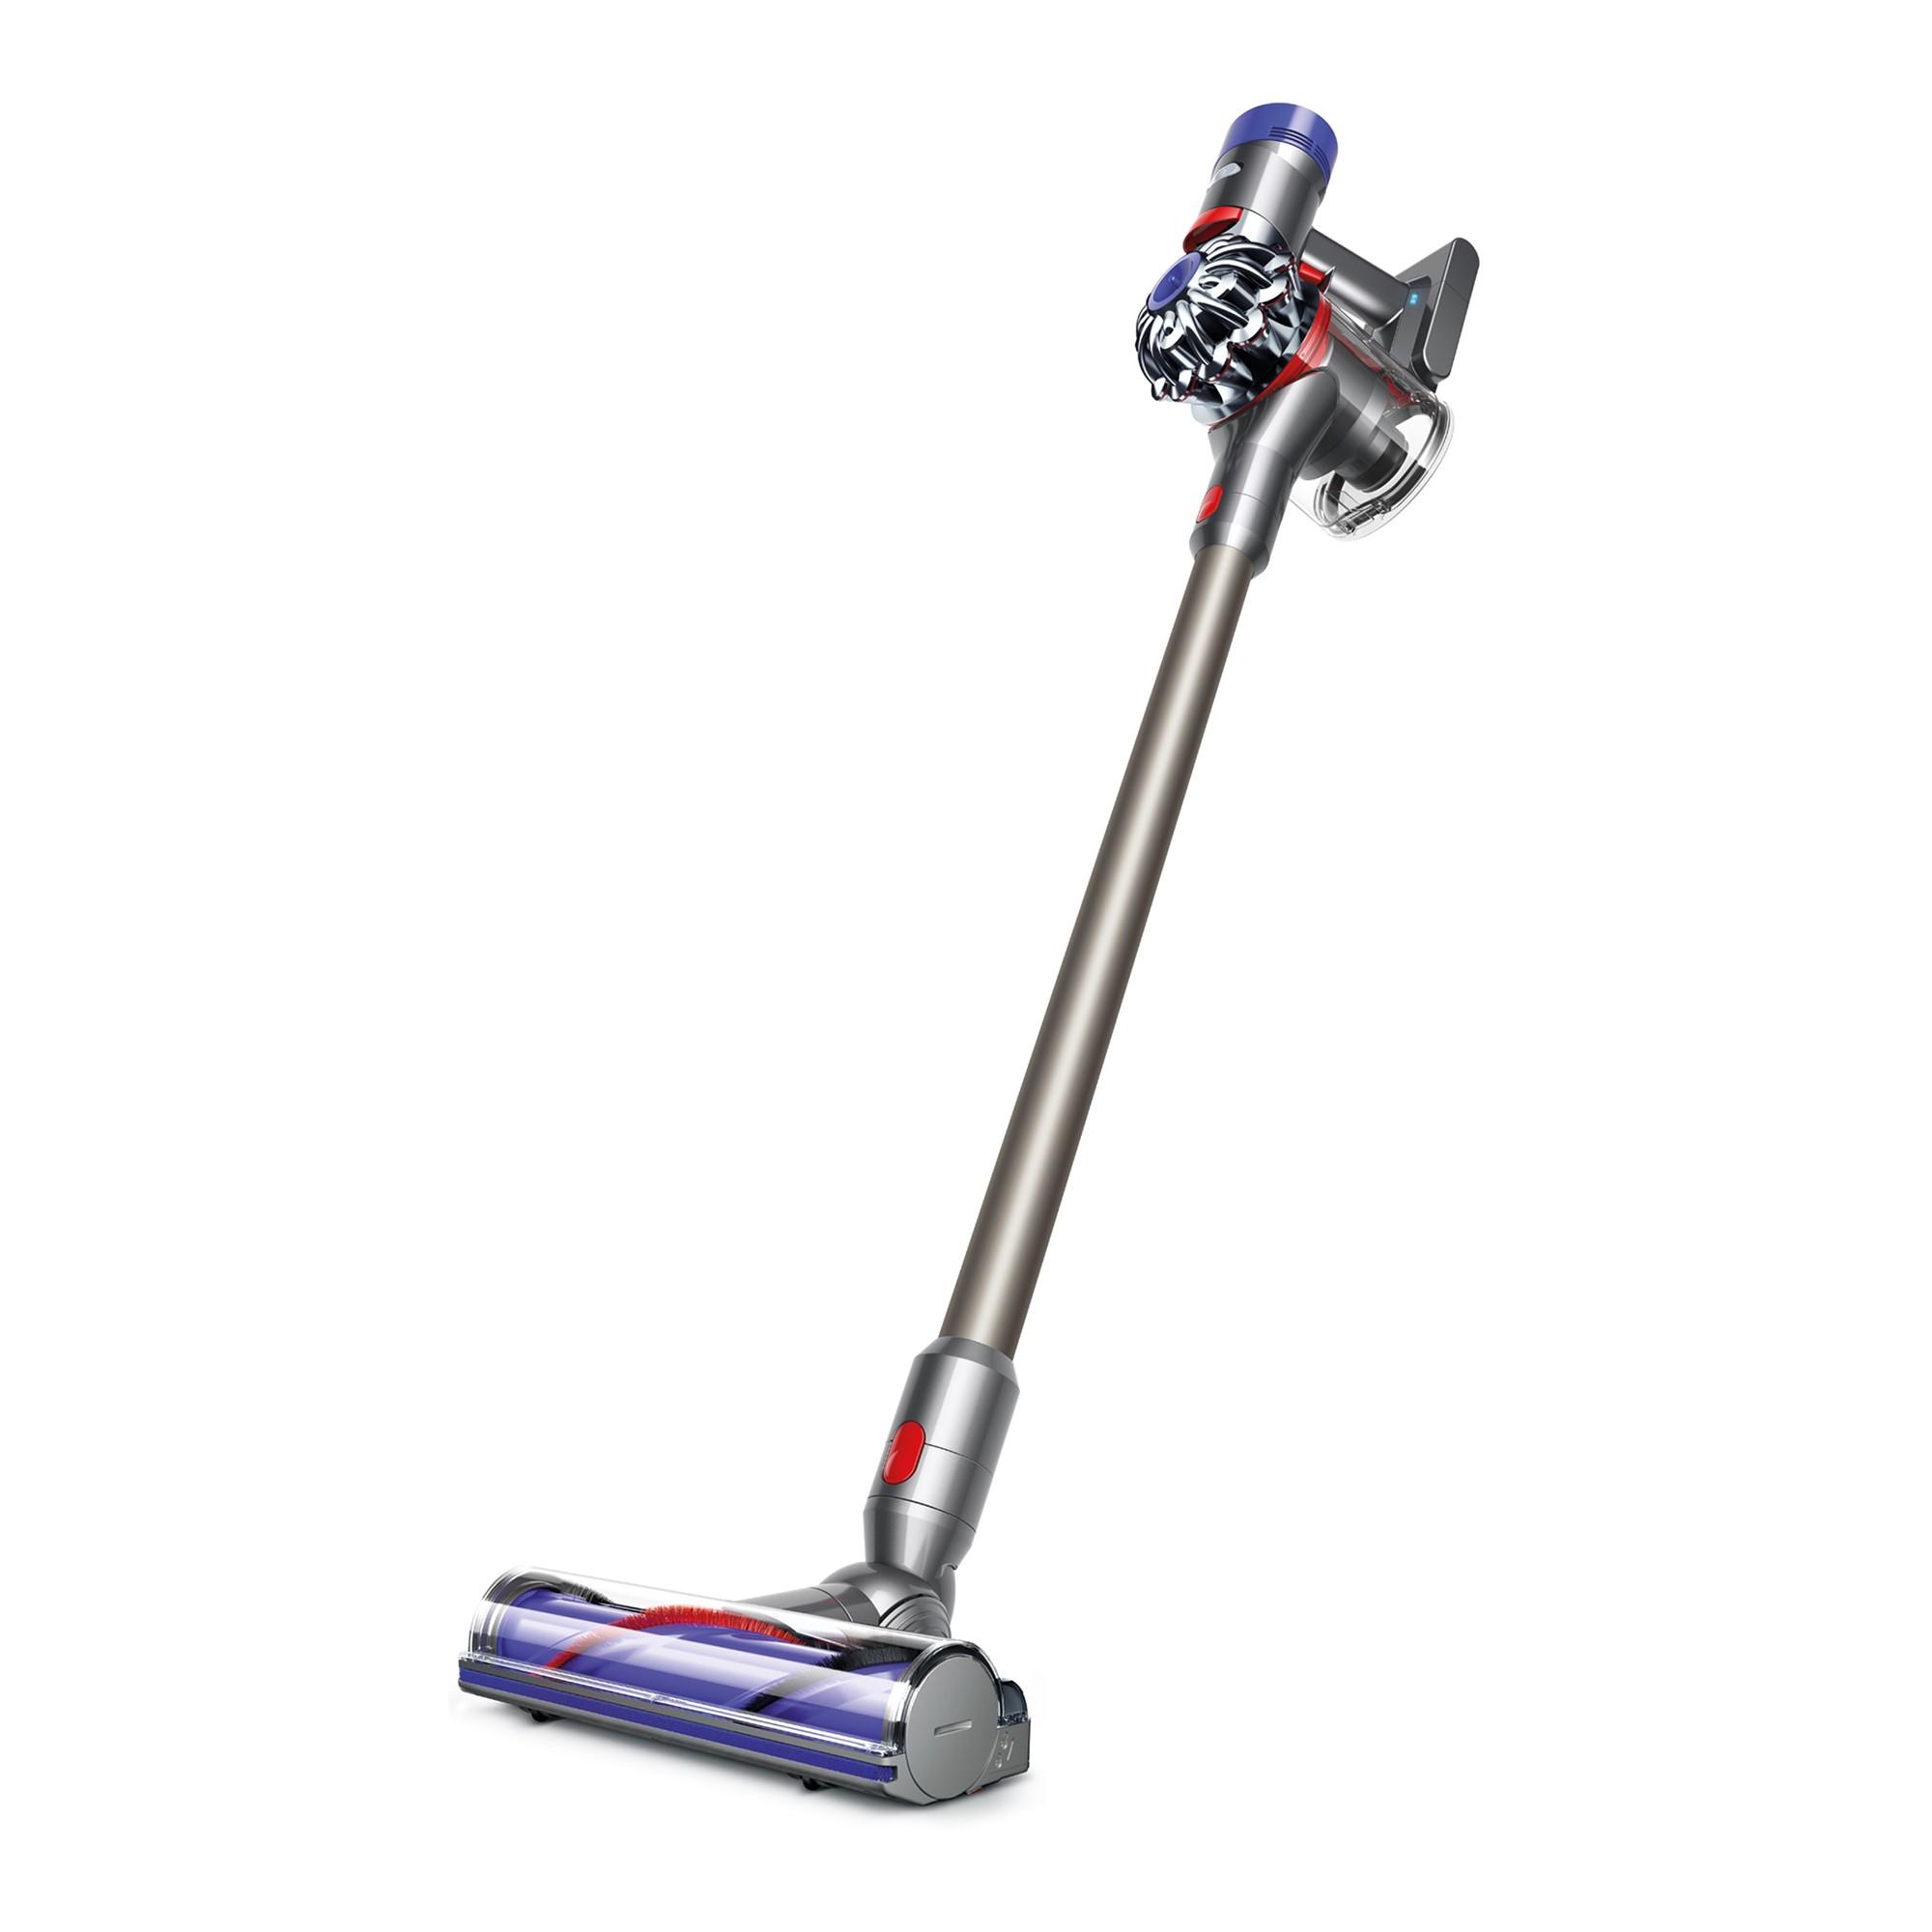 Dyson V8 Animal CordFree Vacuum, Brushed Nickel